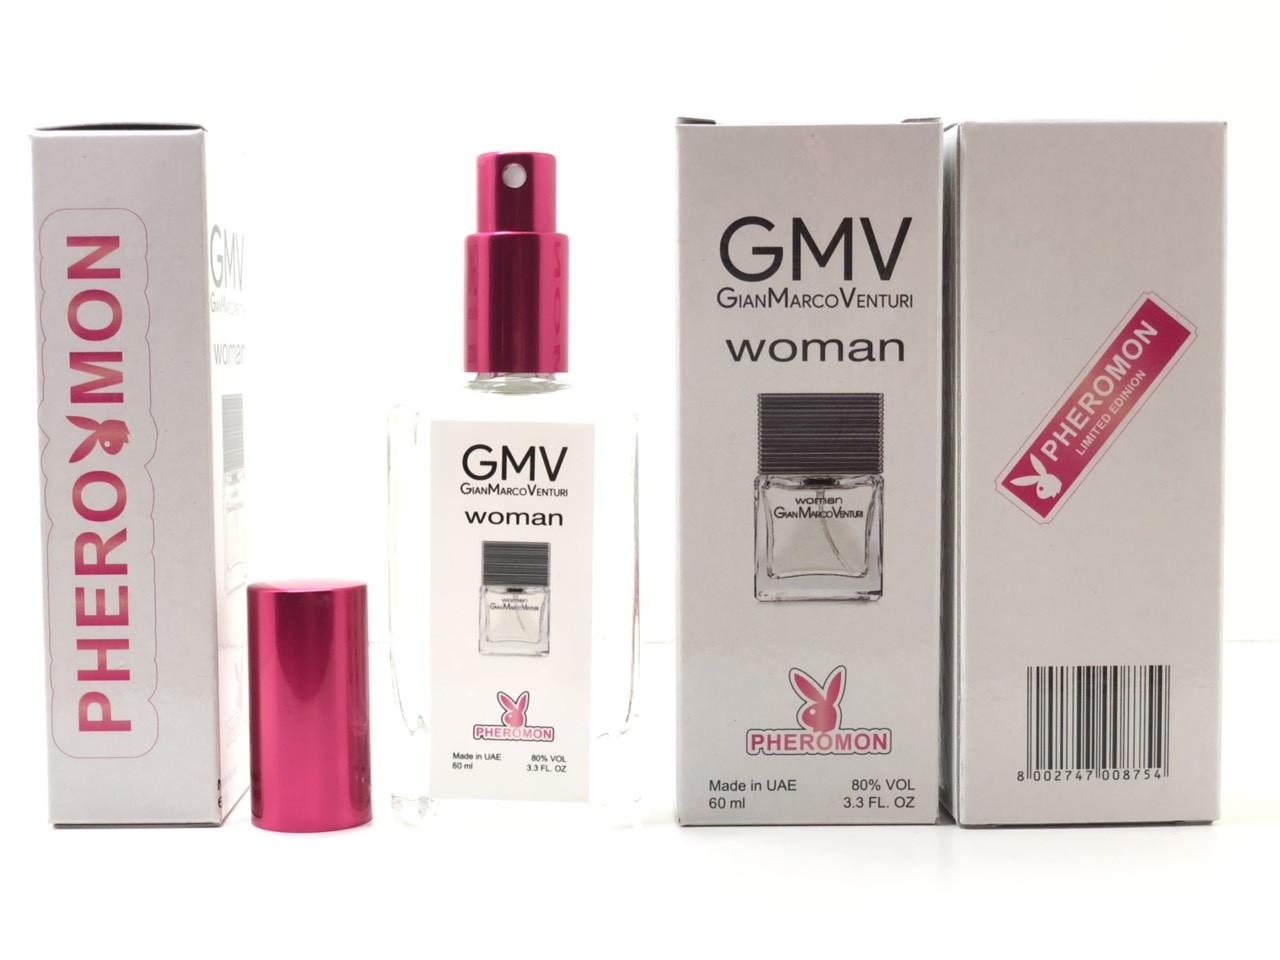 Gian Marco Venturi WOMAN женский парфюм тестер 60 ml в цветной упаковке с феромонами (реплика)